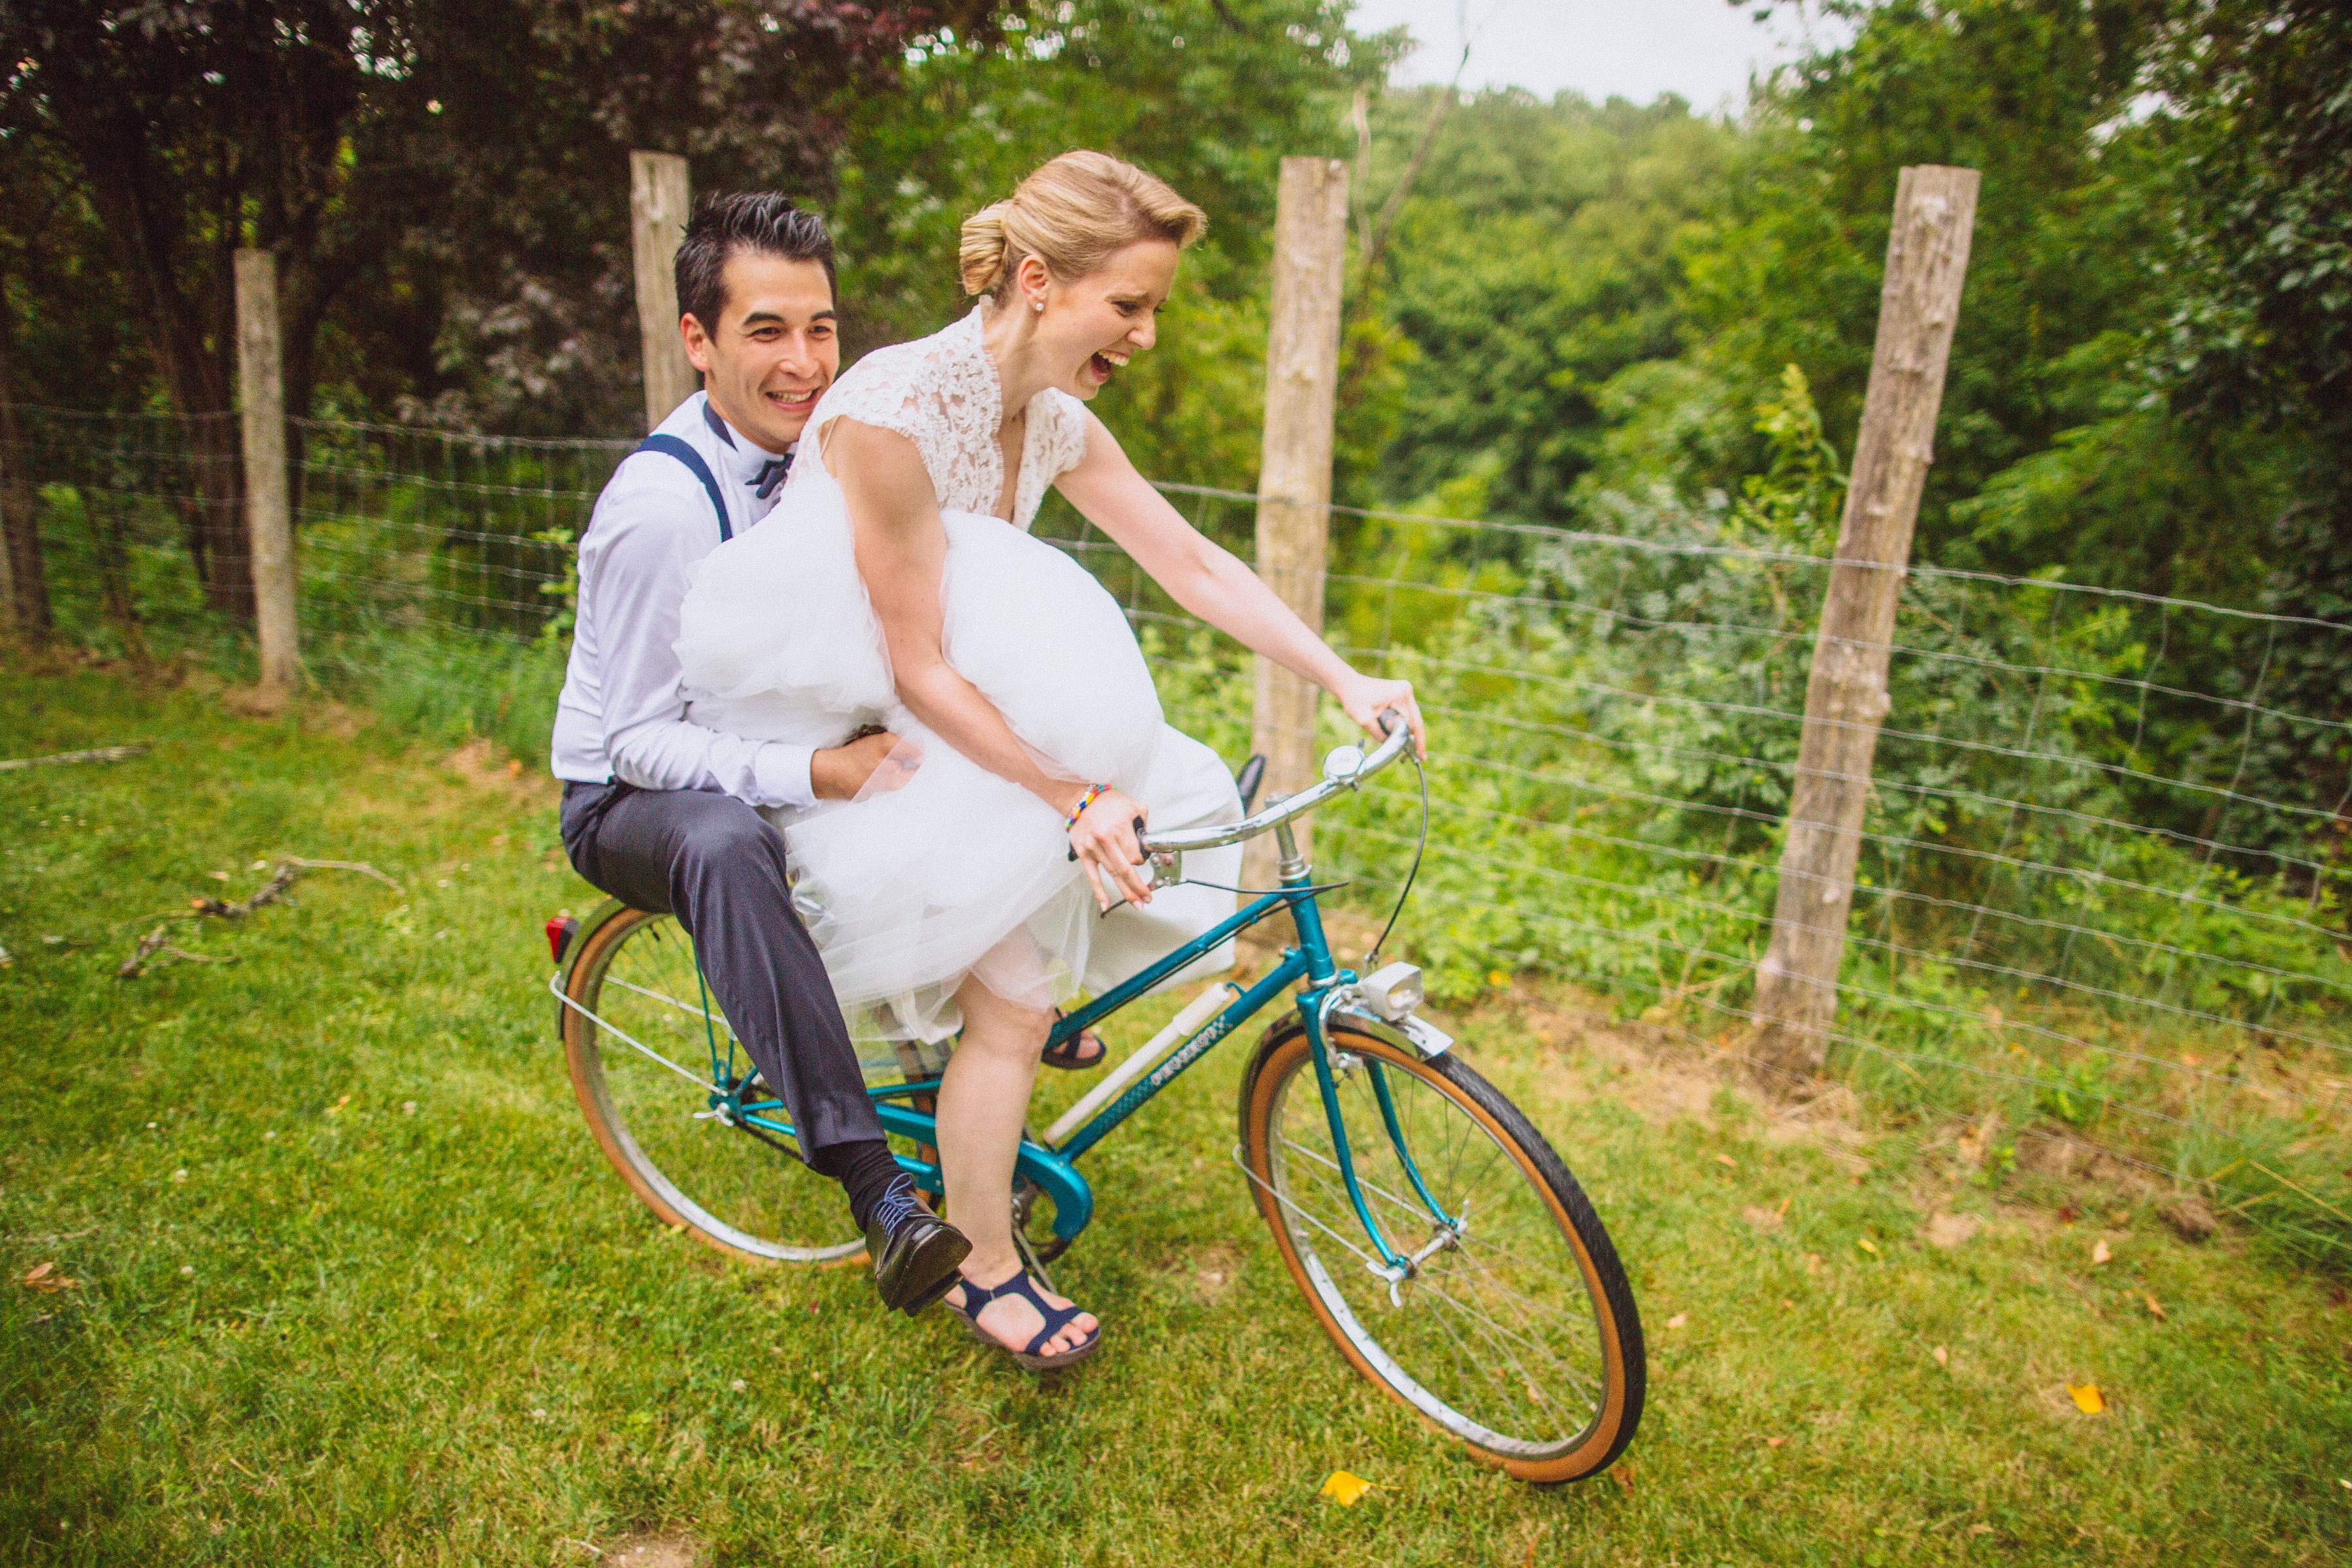 camille_nico___mariage_____ricardo_vieira_photographe_322